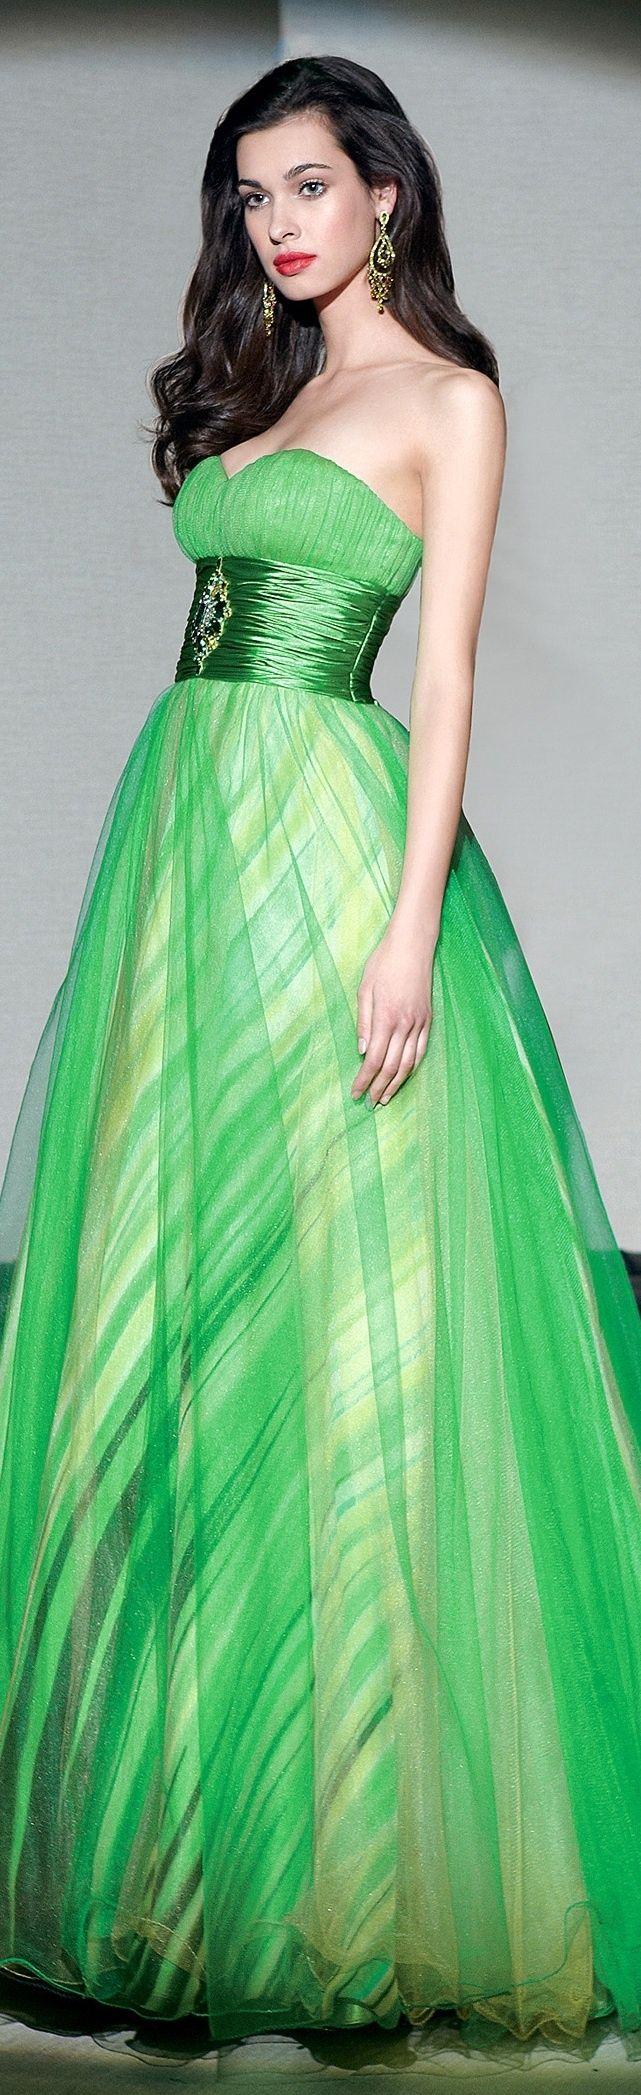 46 best Green Dress images on Pinterest | Grünes kleid, Abendkleid ...